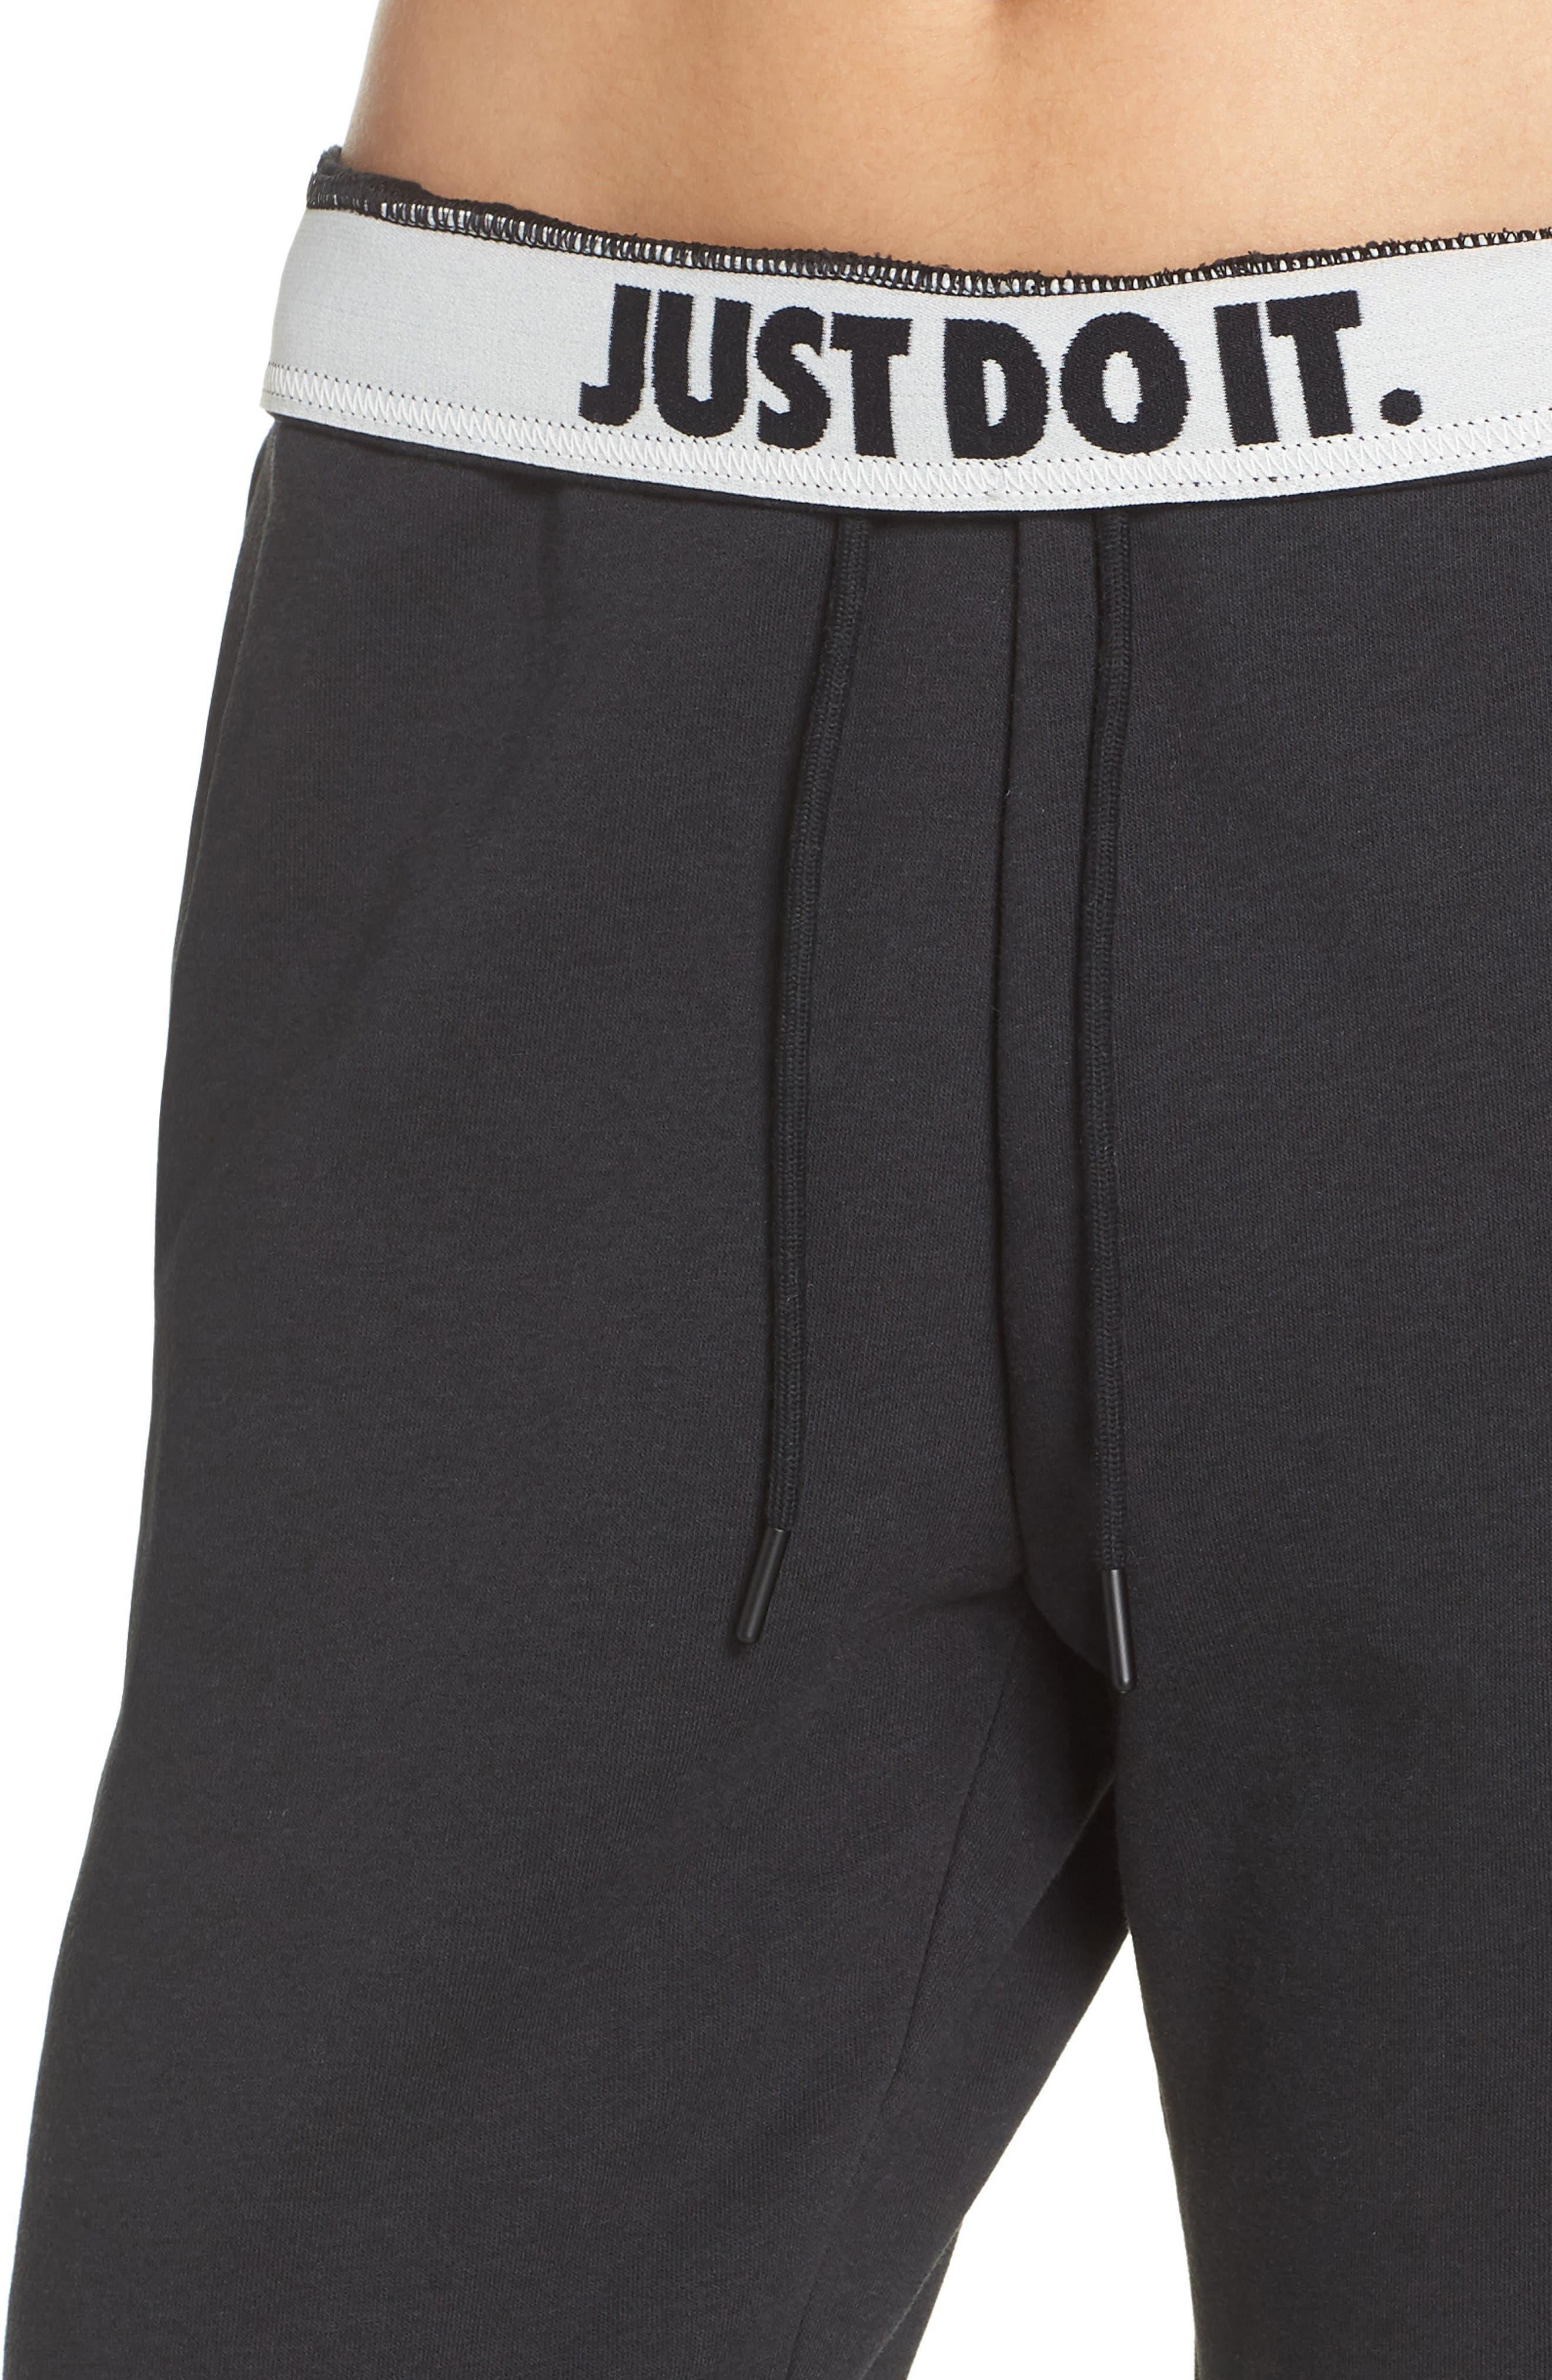 Sportswear Rally Jogger Pants,                             Alternate thumbnail 4, color,                             BLACK/ BLACK/ WHITE